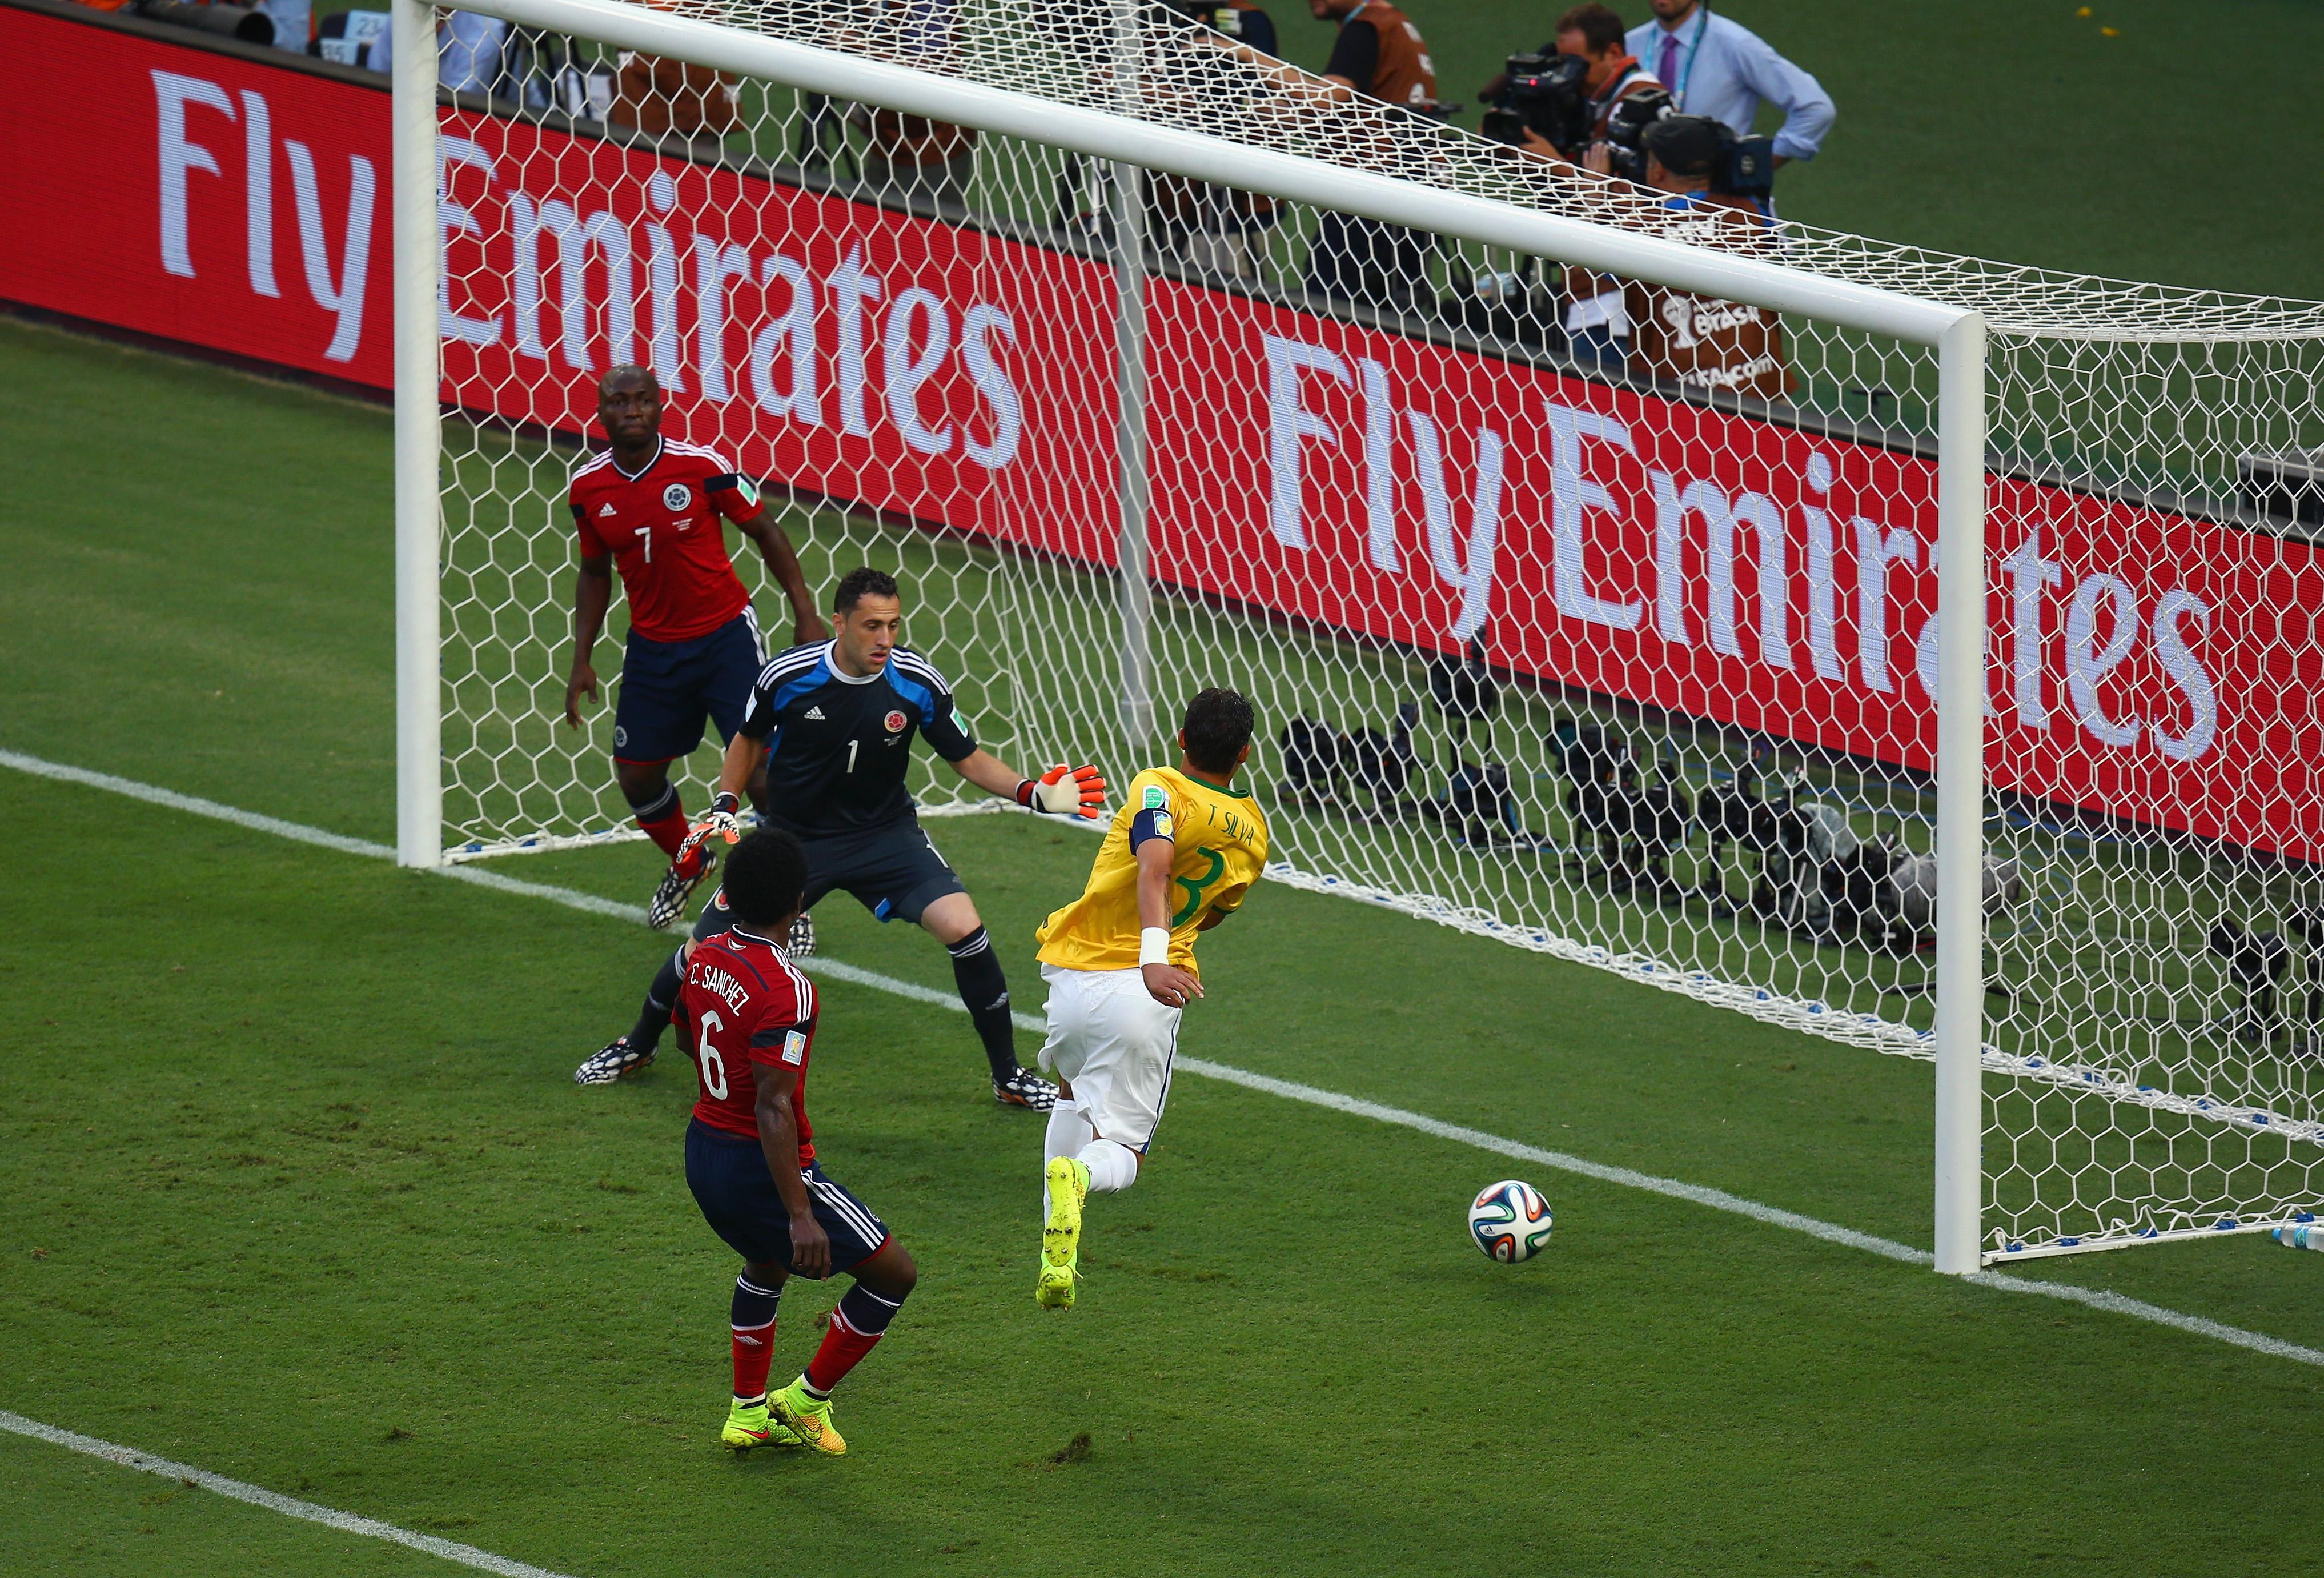 Brasilien gegen Kolumbien: Tor durch Thiago Silva für Brasilien (Video)